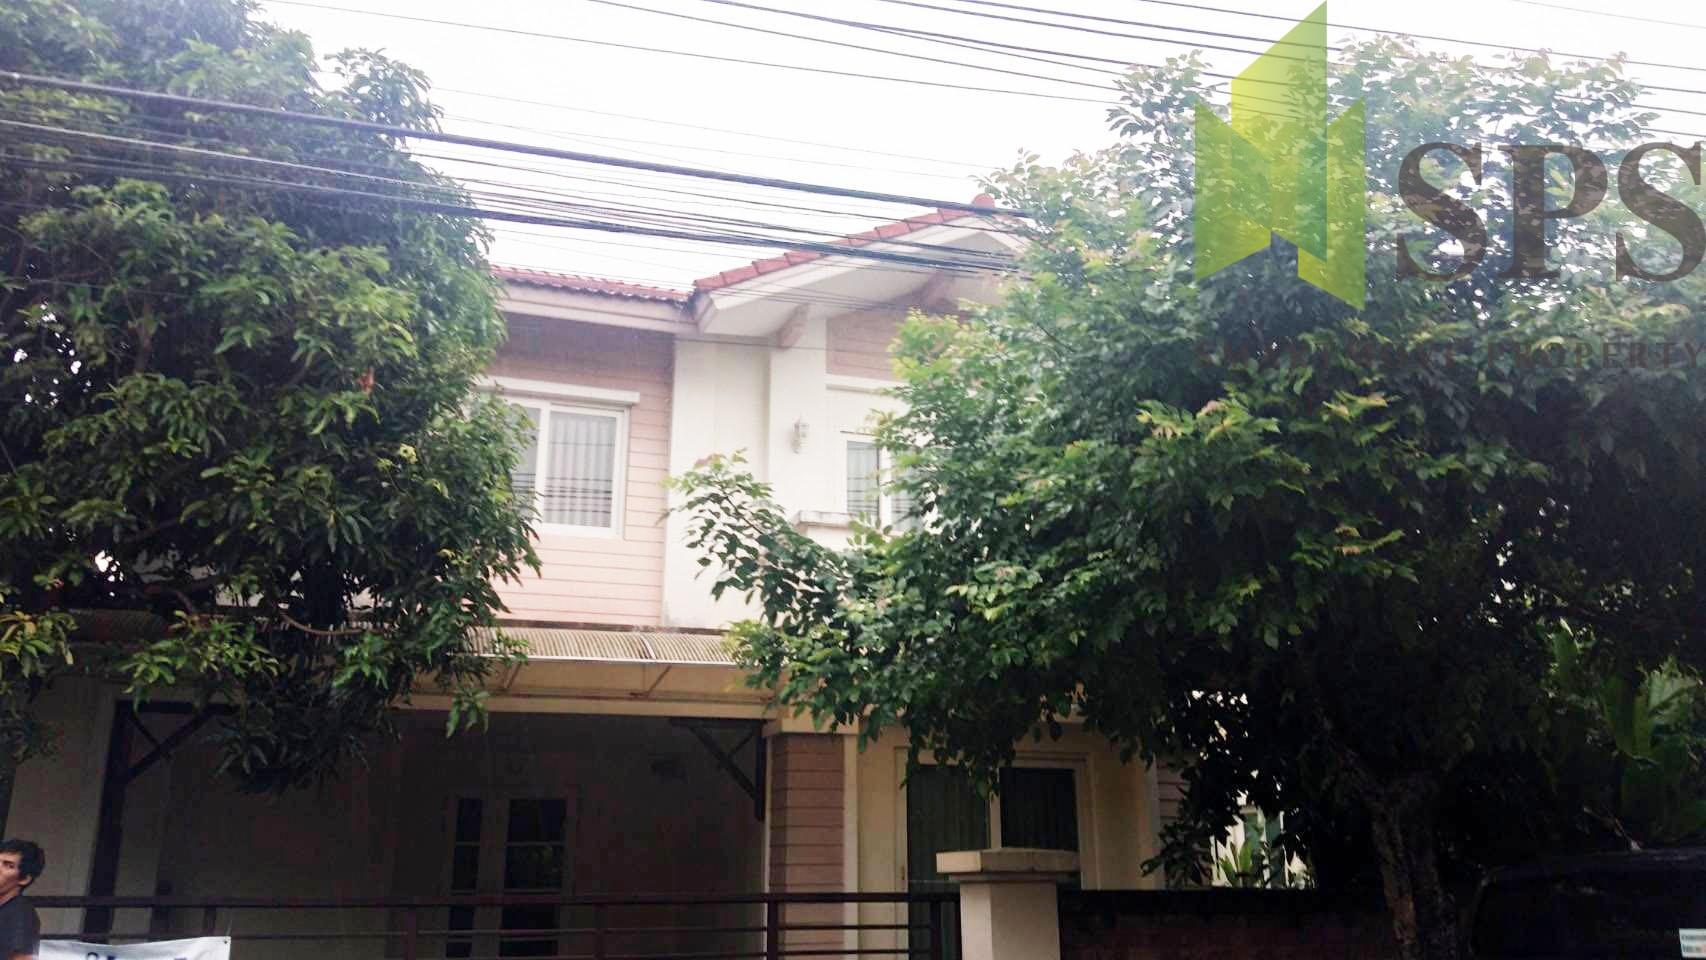 For Rent Single House Casa Ville Srinakarin ให้เช่า บ้านเดี่ยวโครงการ คาซ่าวิลล์ ศรีนครินทร์ ( SPSPE232)